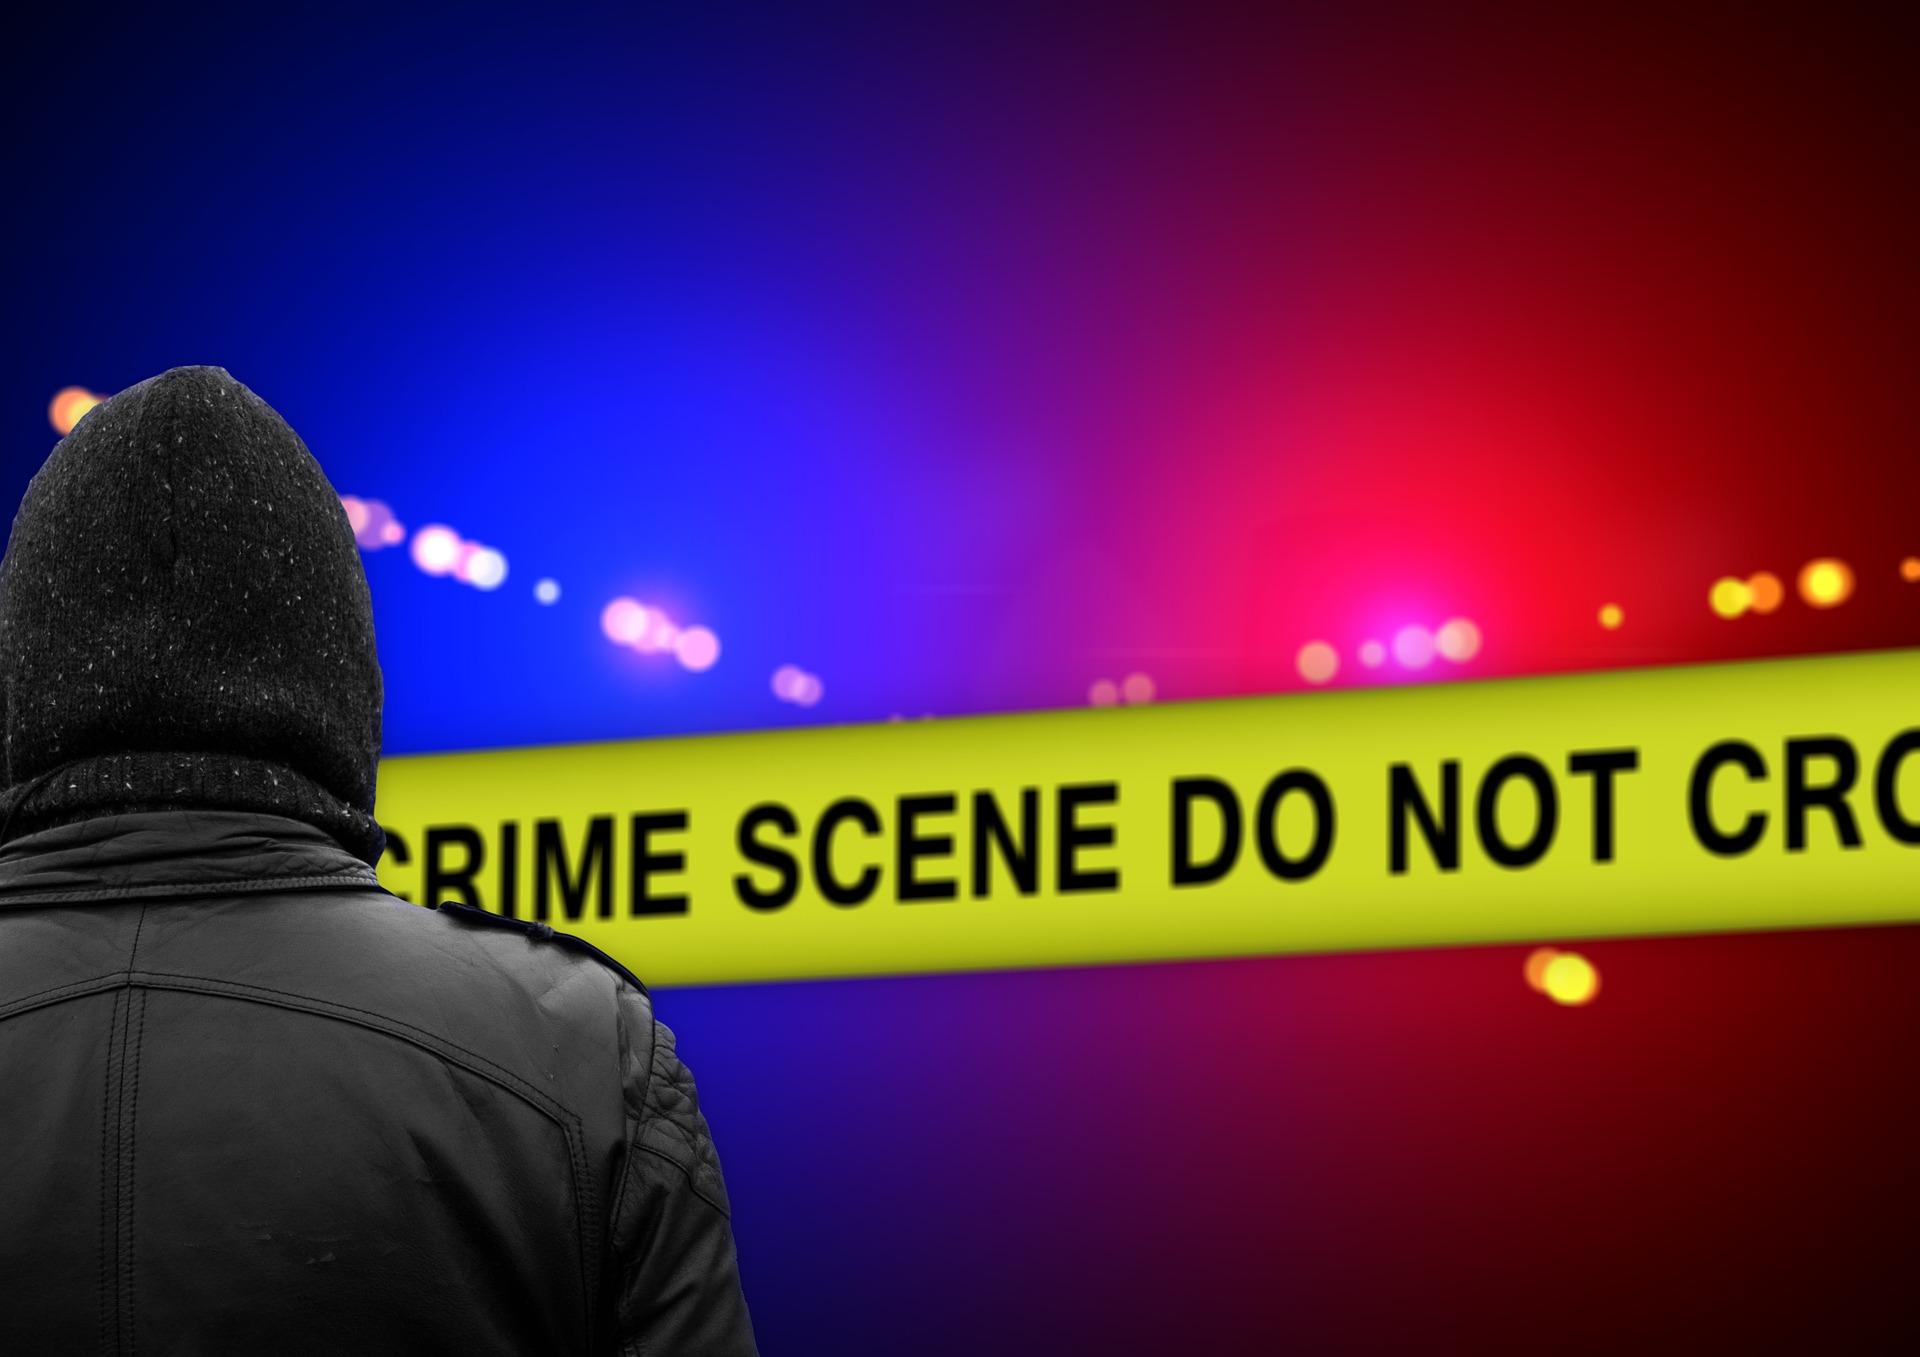 Burglars and Crime Scene